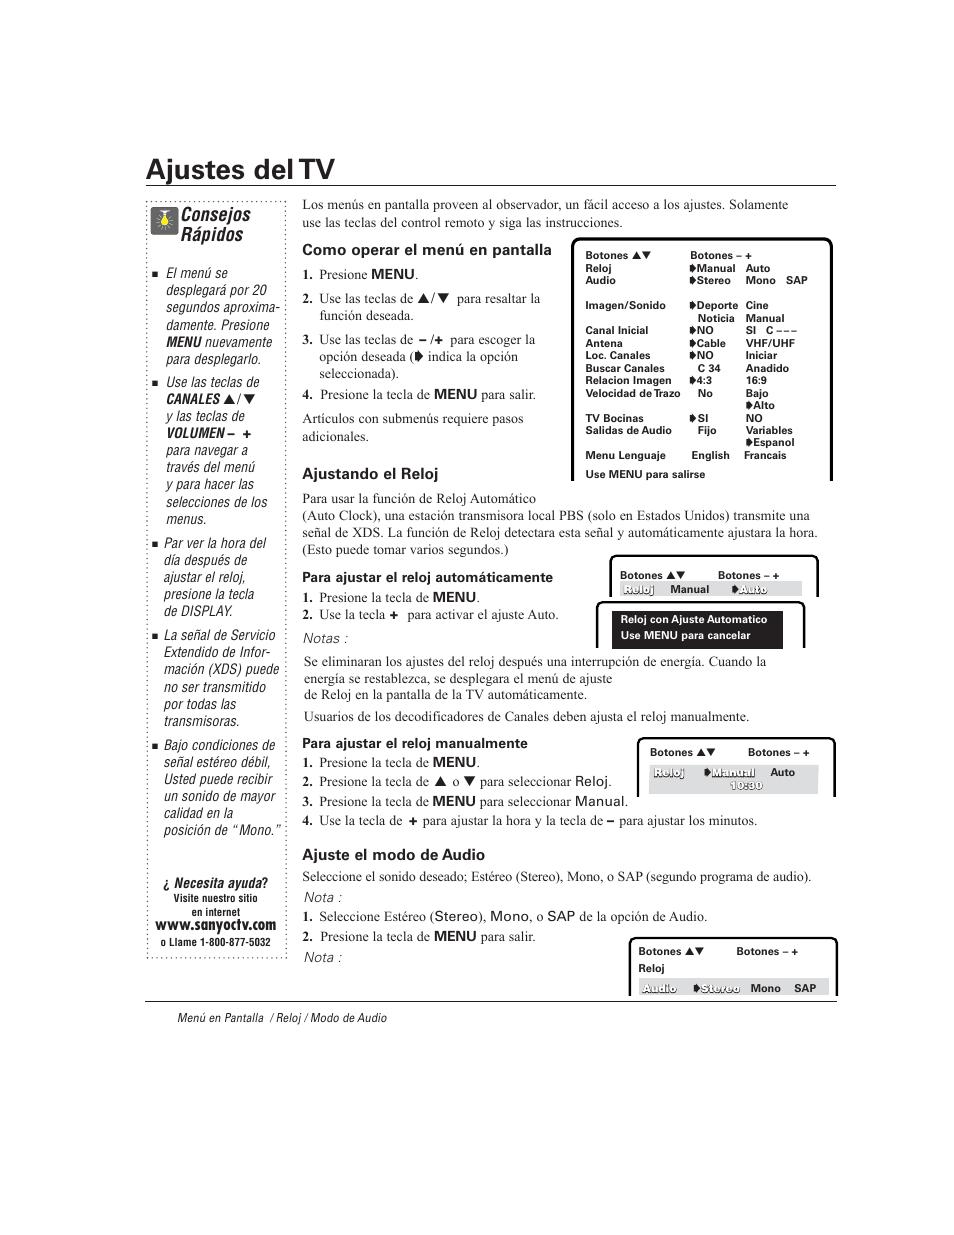 ajustes del tv consejos r pidos sanyo ds27930 user manual page rh manualsdir com Sanyo Model DP42841 Sanyo Model Numbers